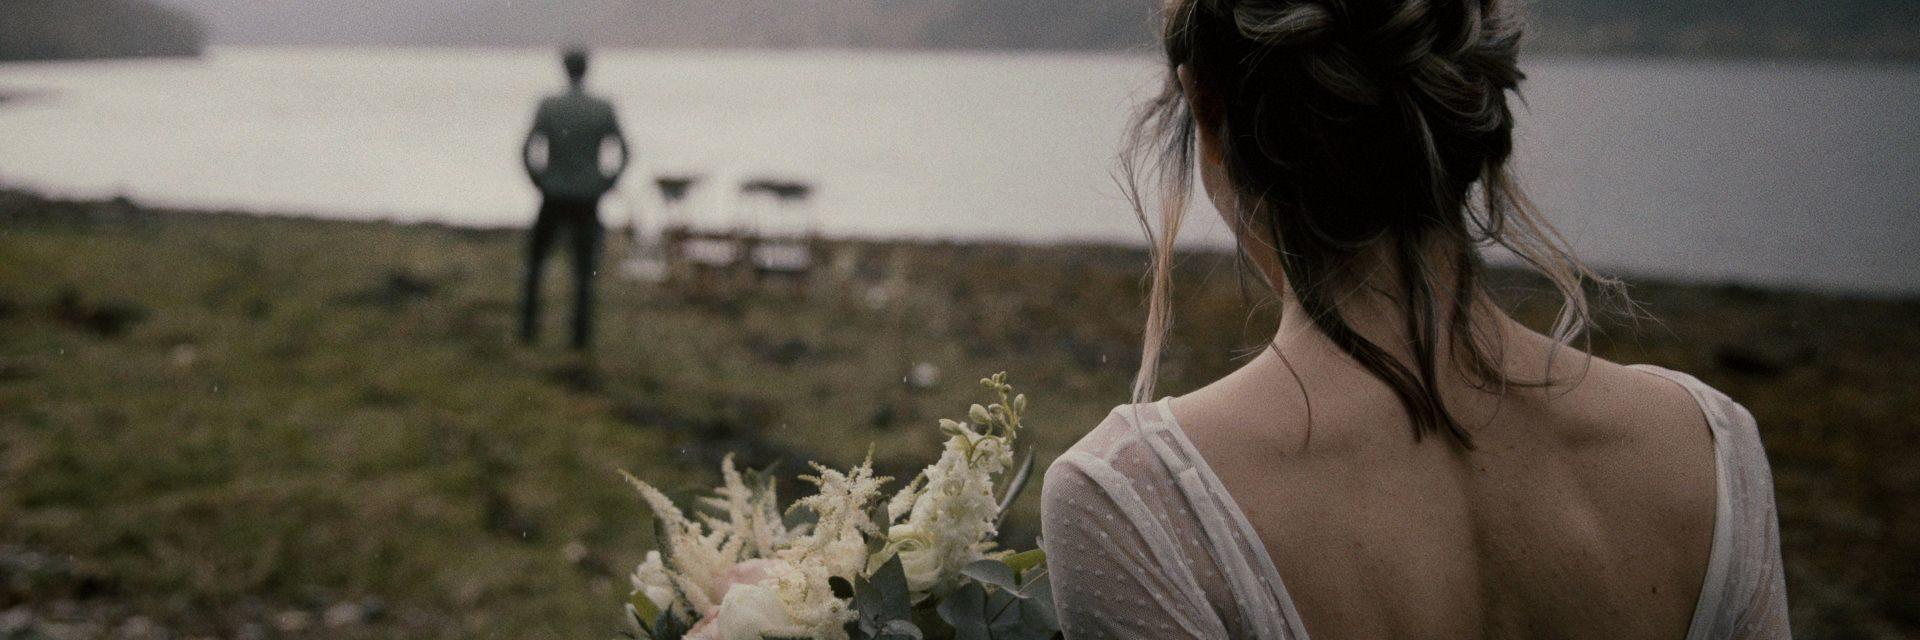 Bergen-wedding-videographer-cinemate-films-02